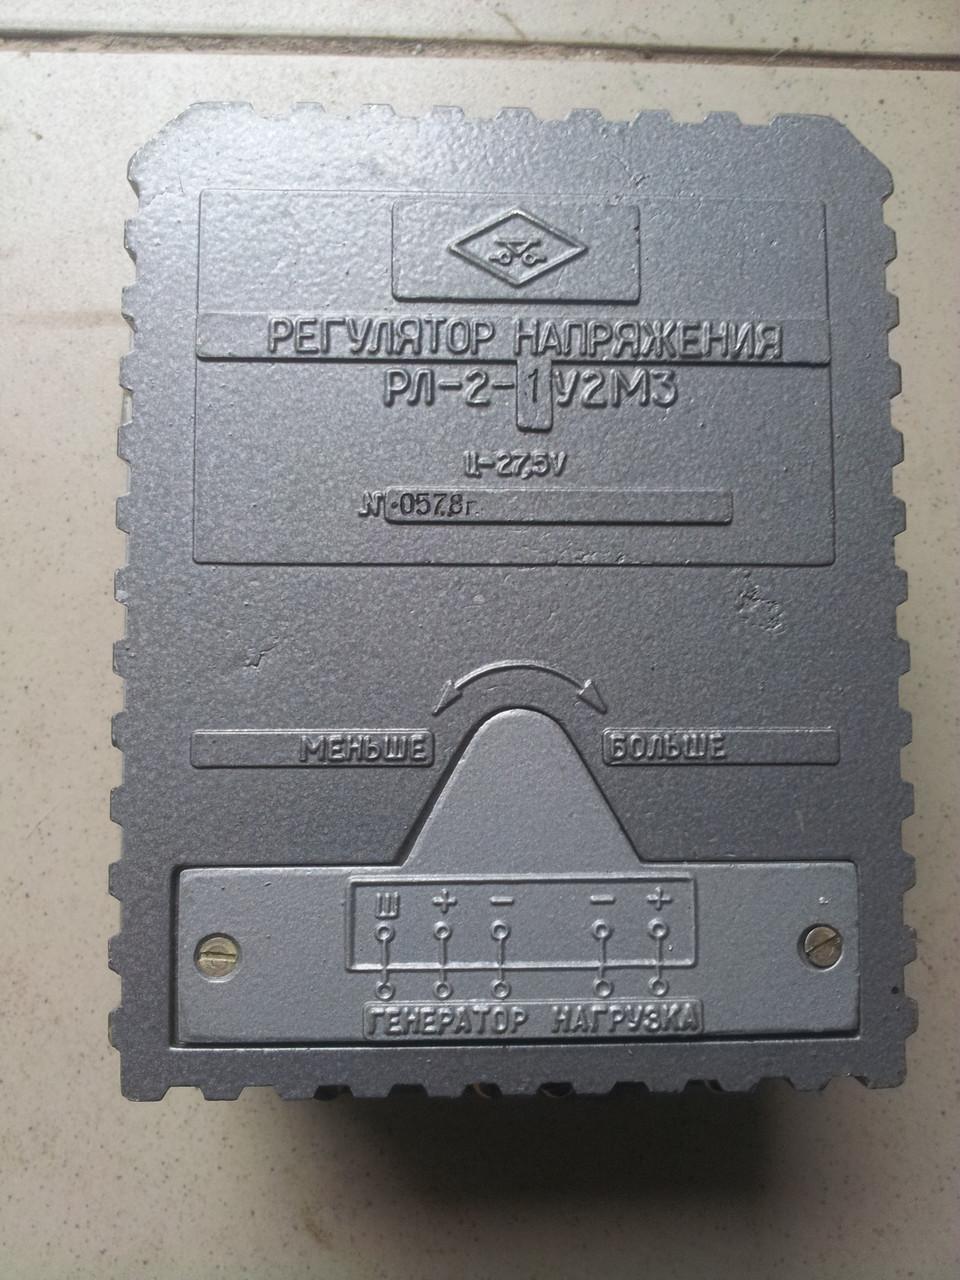 Регулятор Напруги РЛ-2М